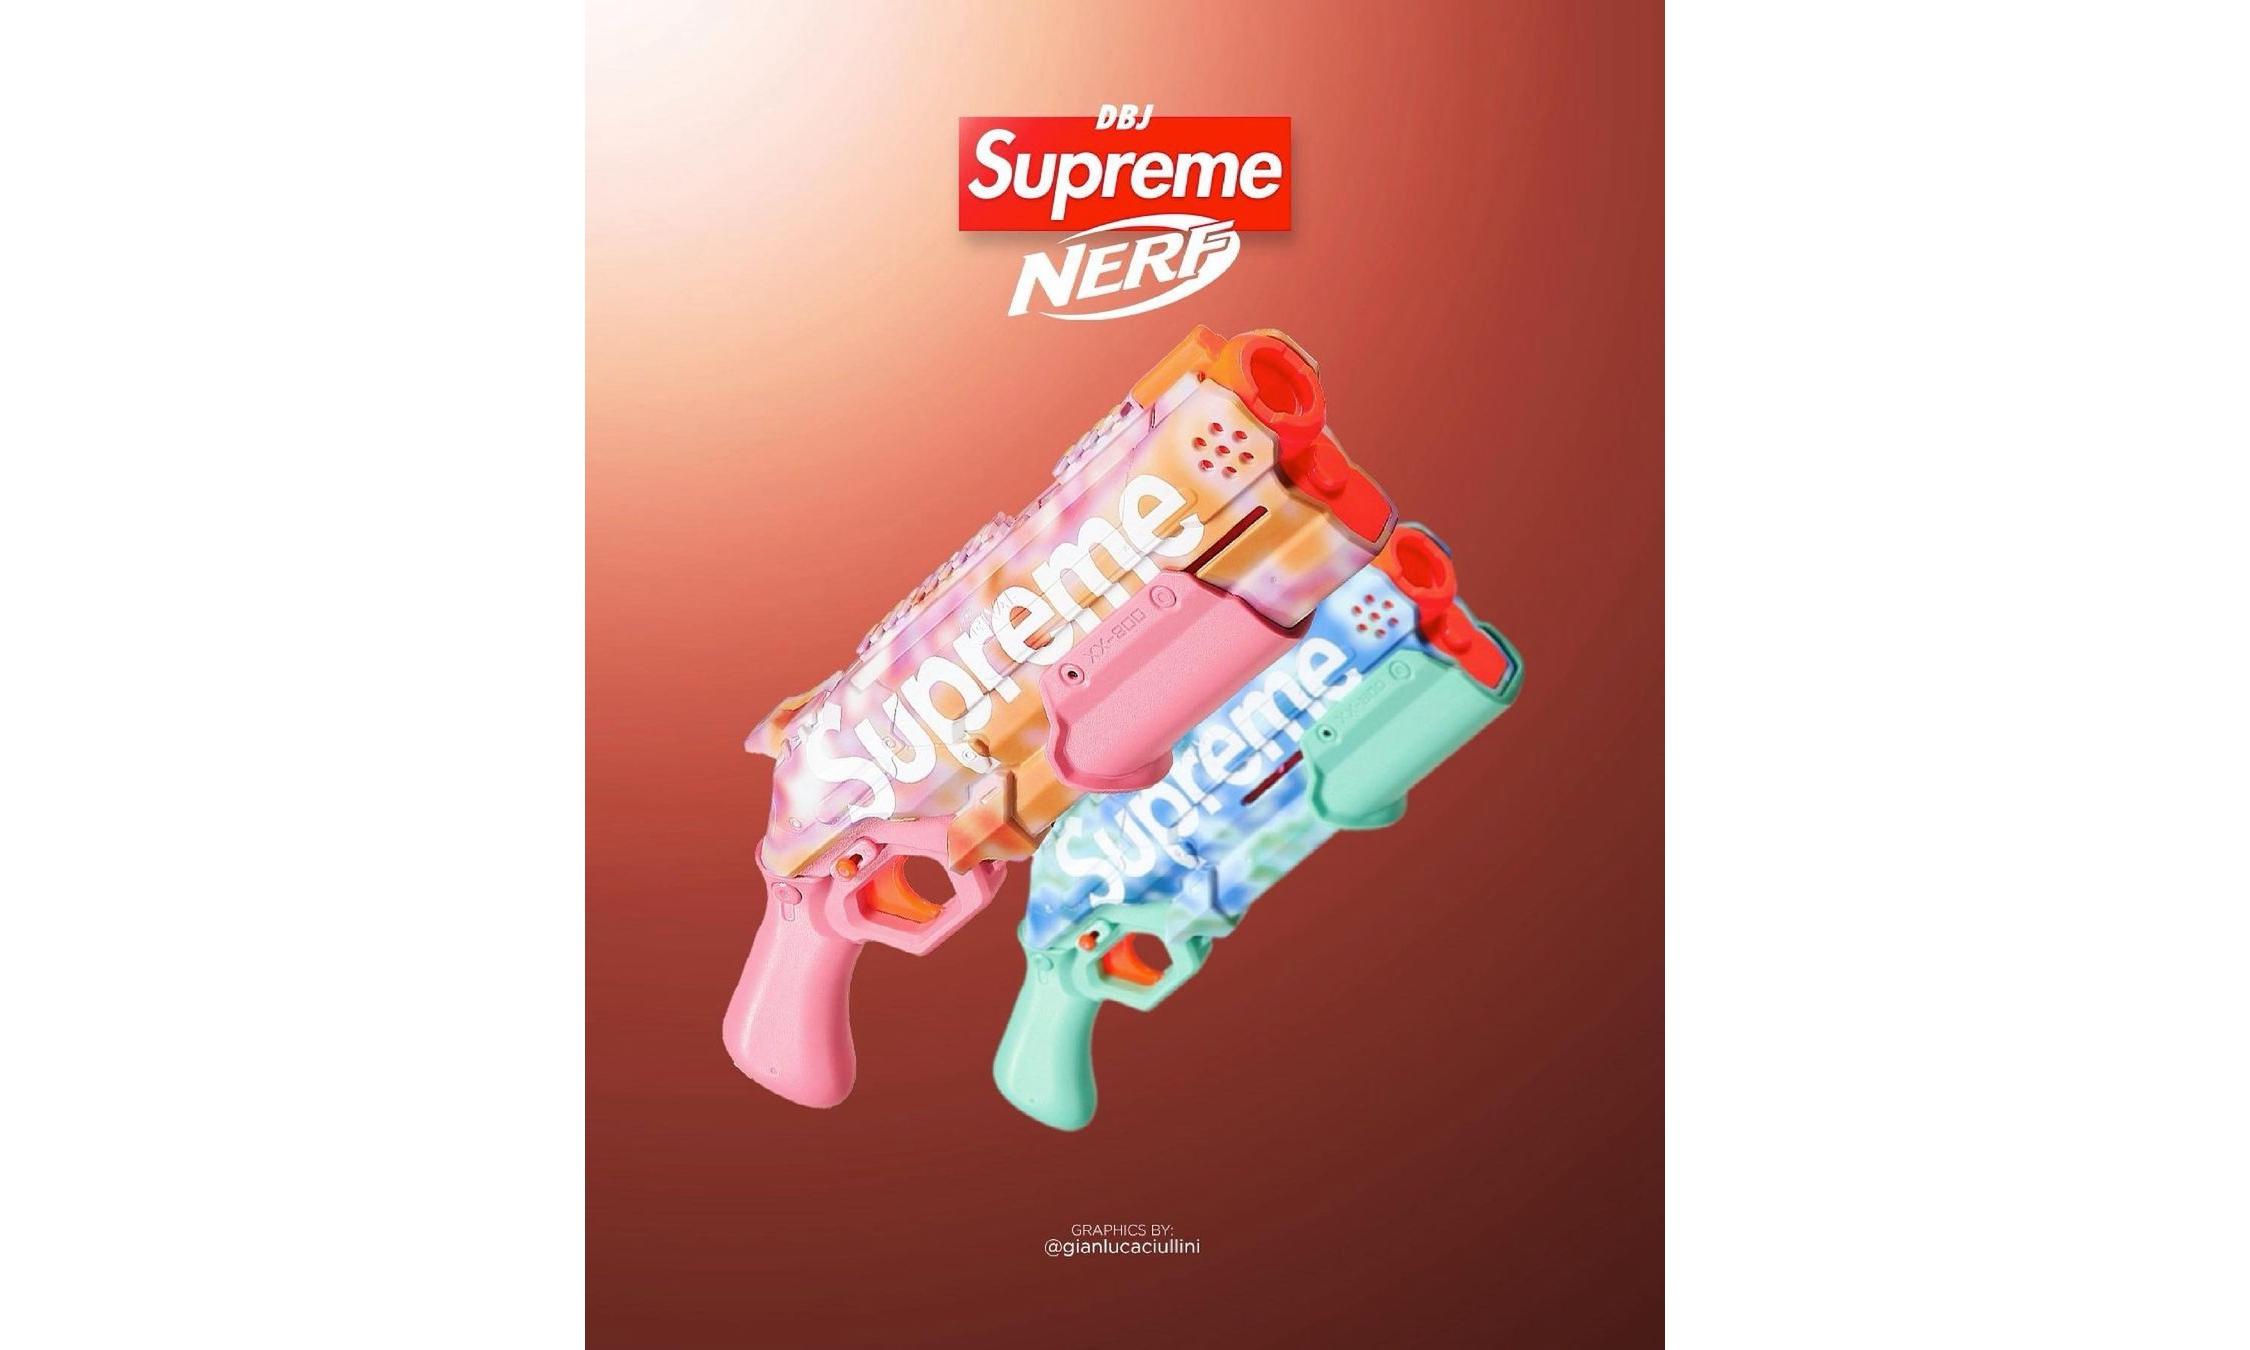 Supreme 本周将携手 NERF 推出玩具枪